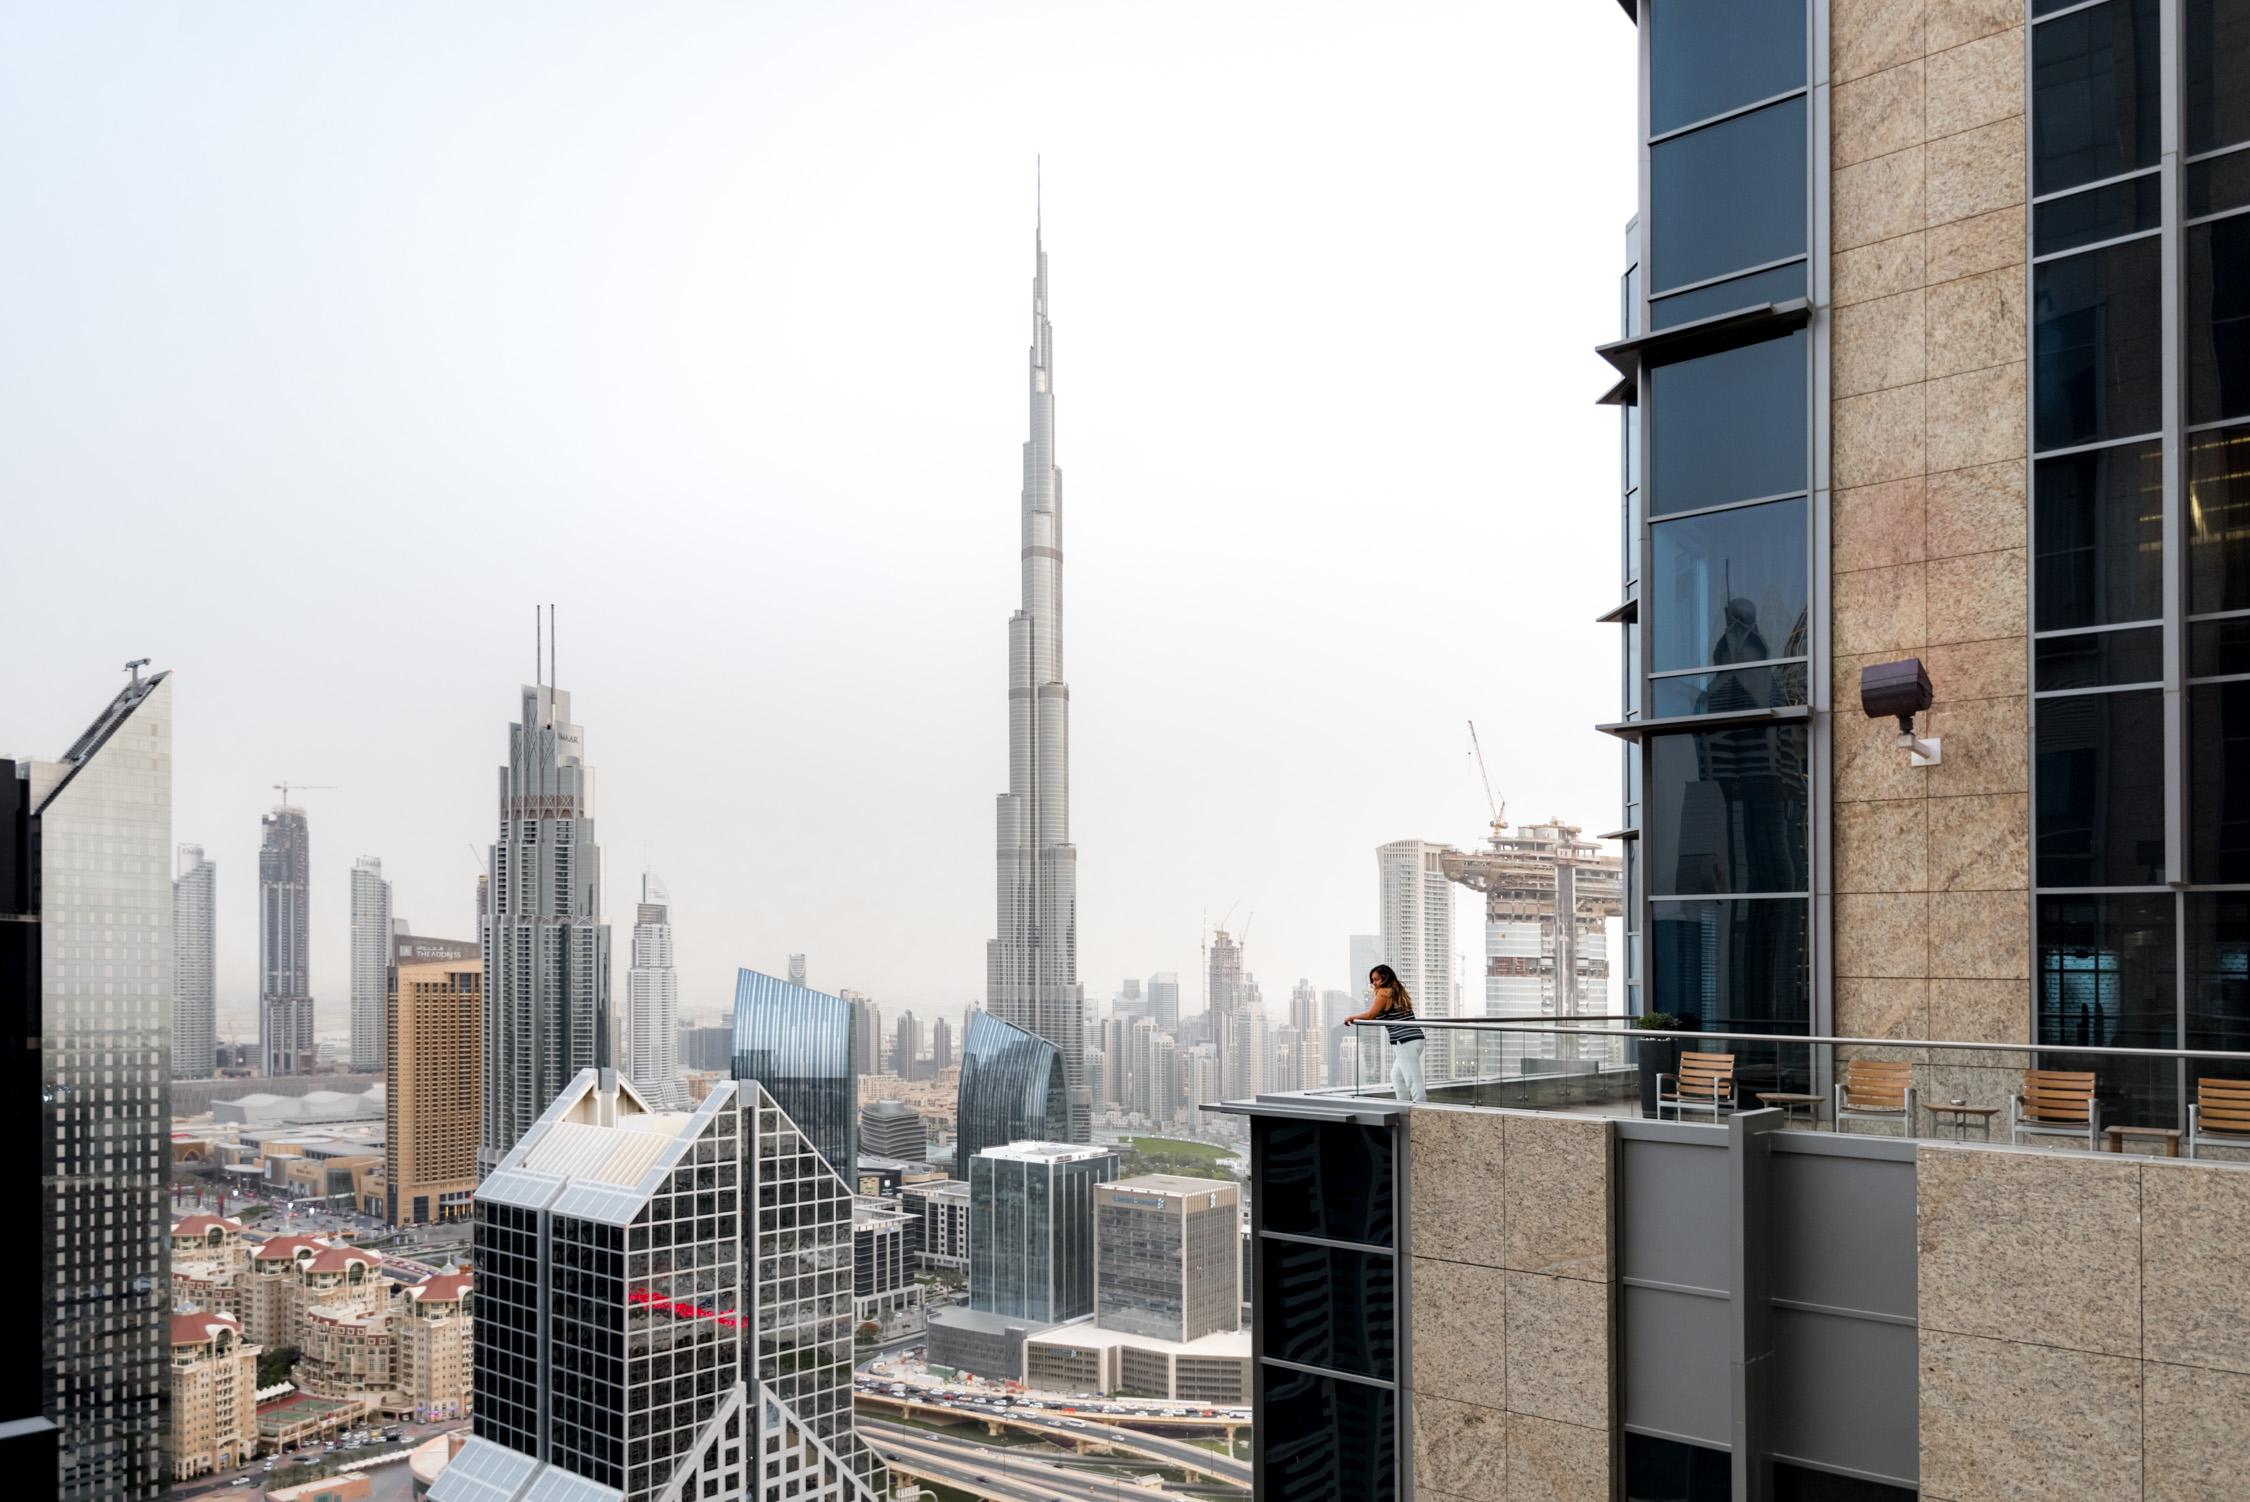 Dubai-446-20180512.jpg